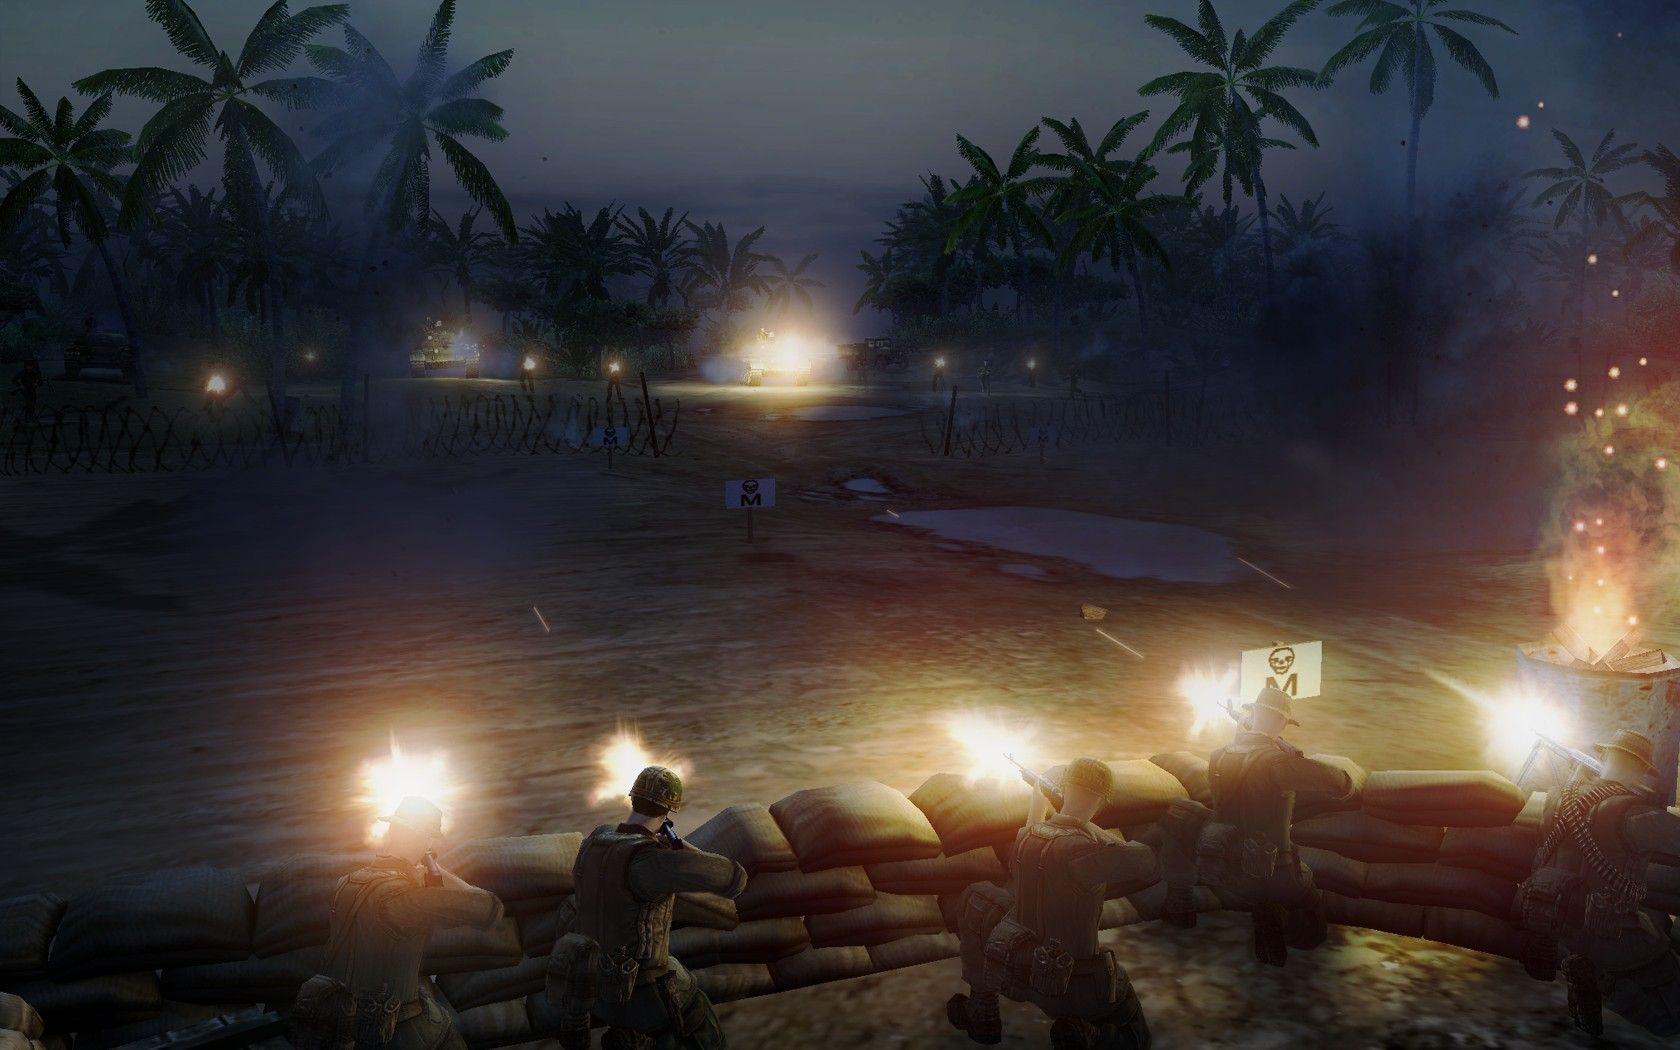 Men Of War: Vietnam להורדה בלינקים מהירים 5272fdbe77ea46ccc20b70c9dc43a7d6